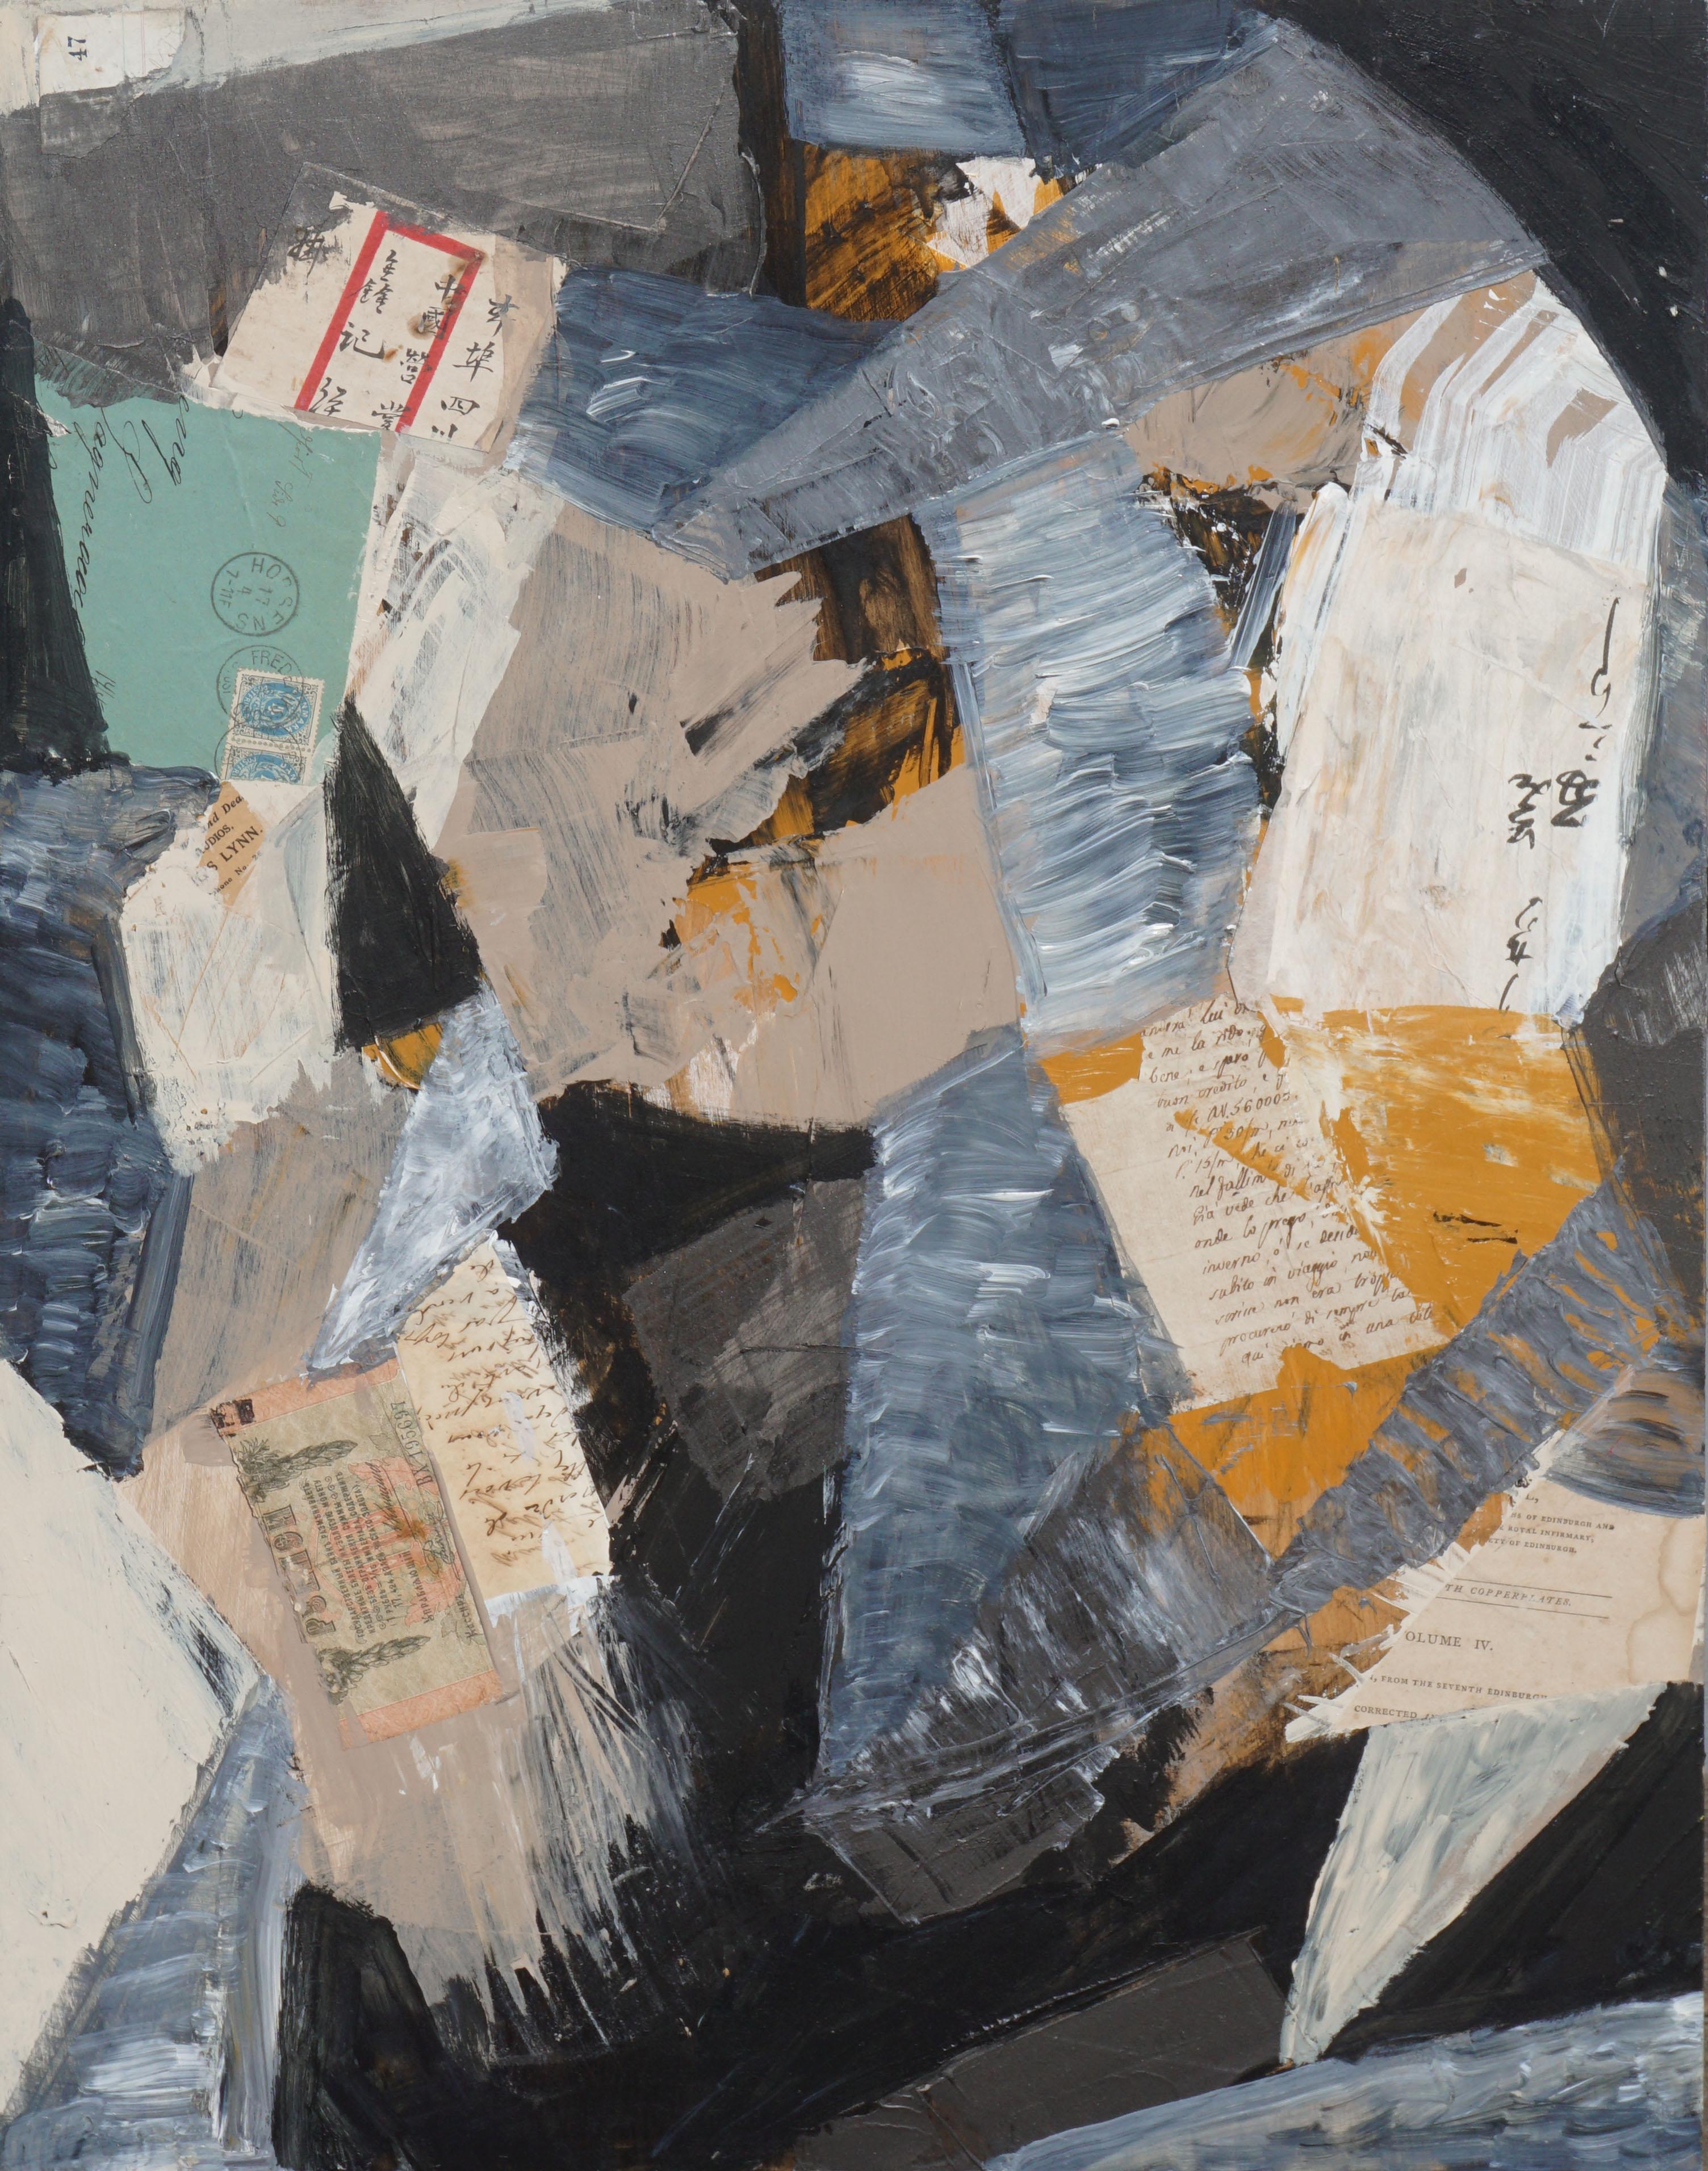 Edinburgh Collage painting by Michael Pauker